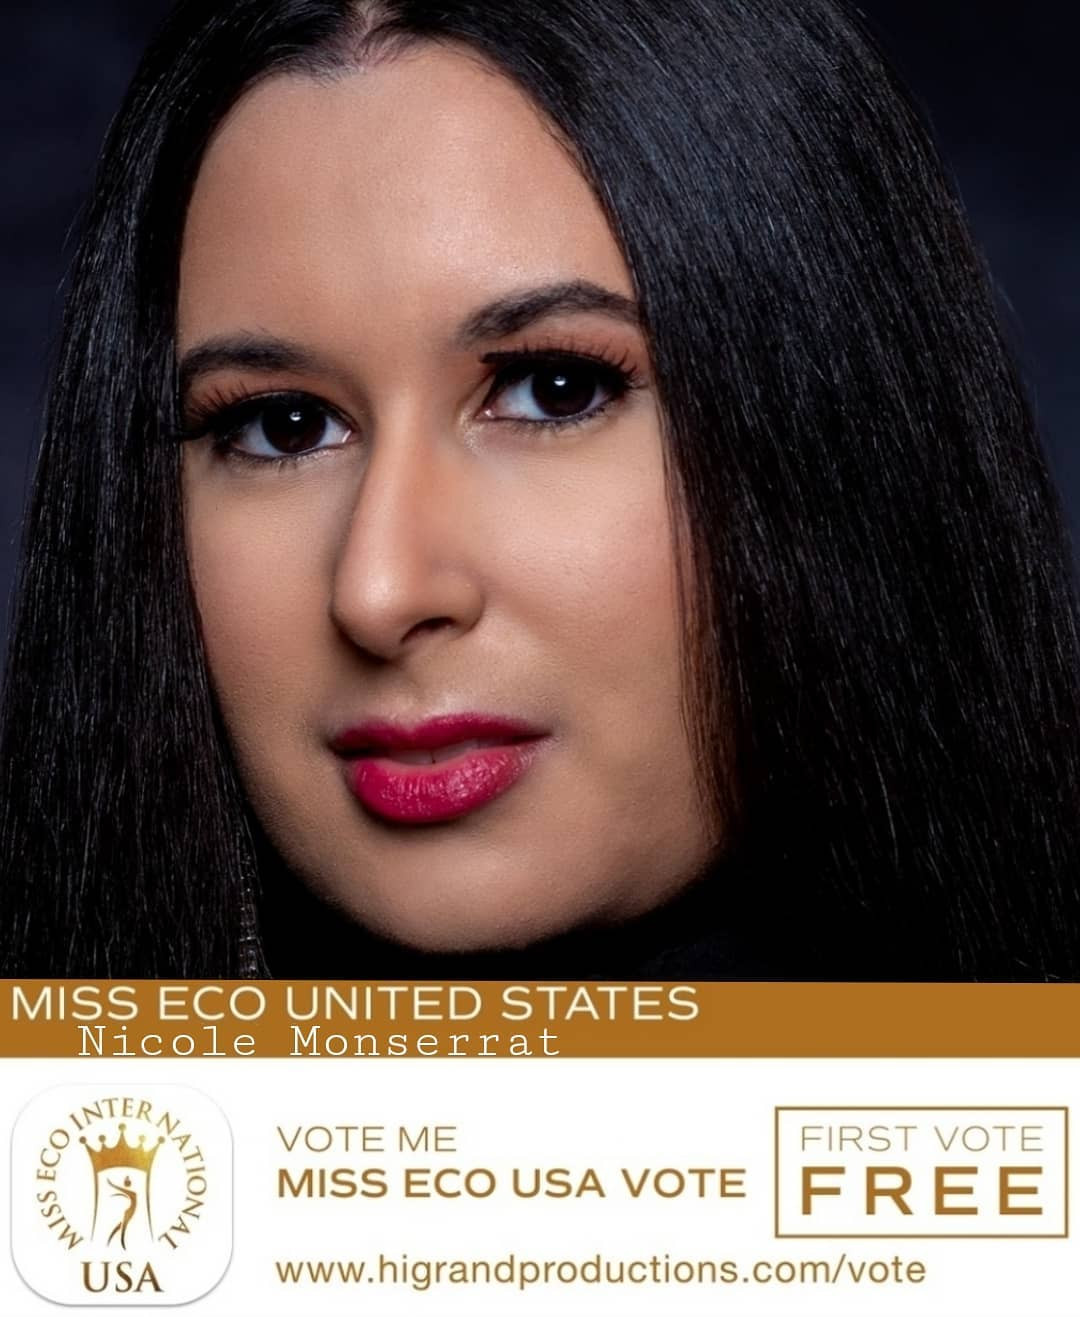 candidatas a miss eco usa 2021. final: 18 june. CJl7Hu